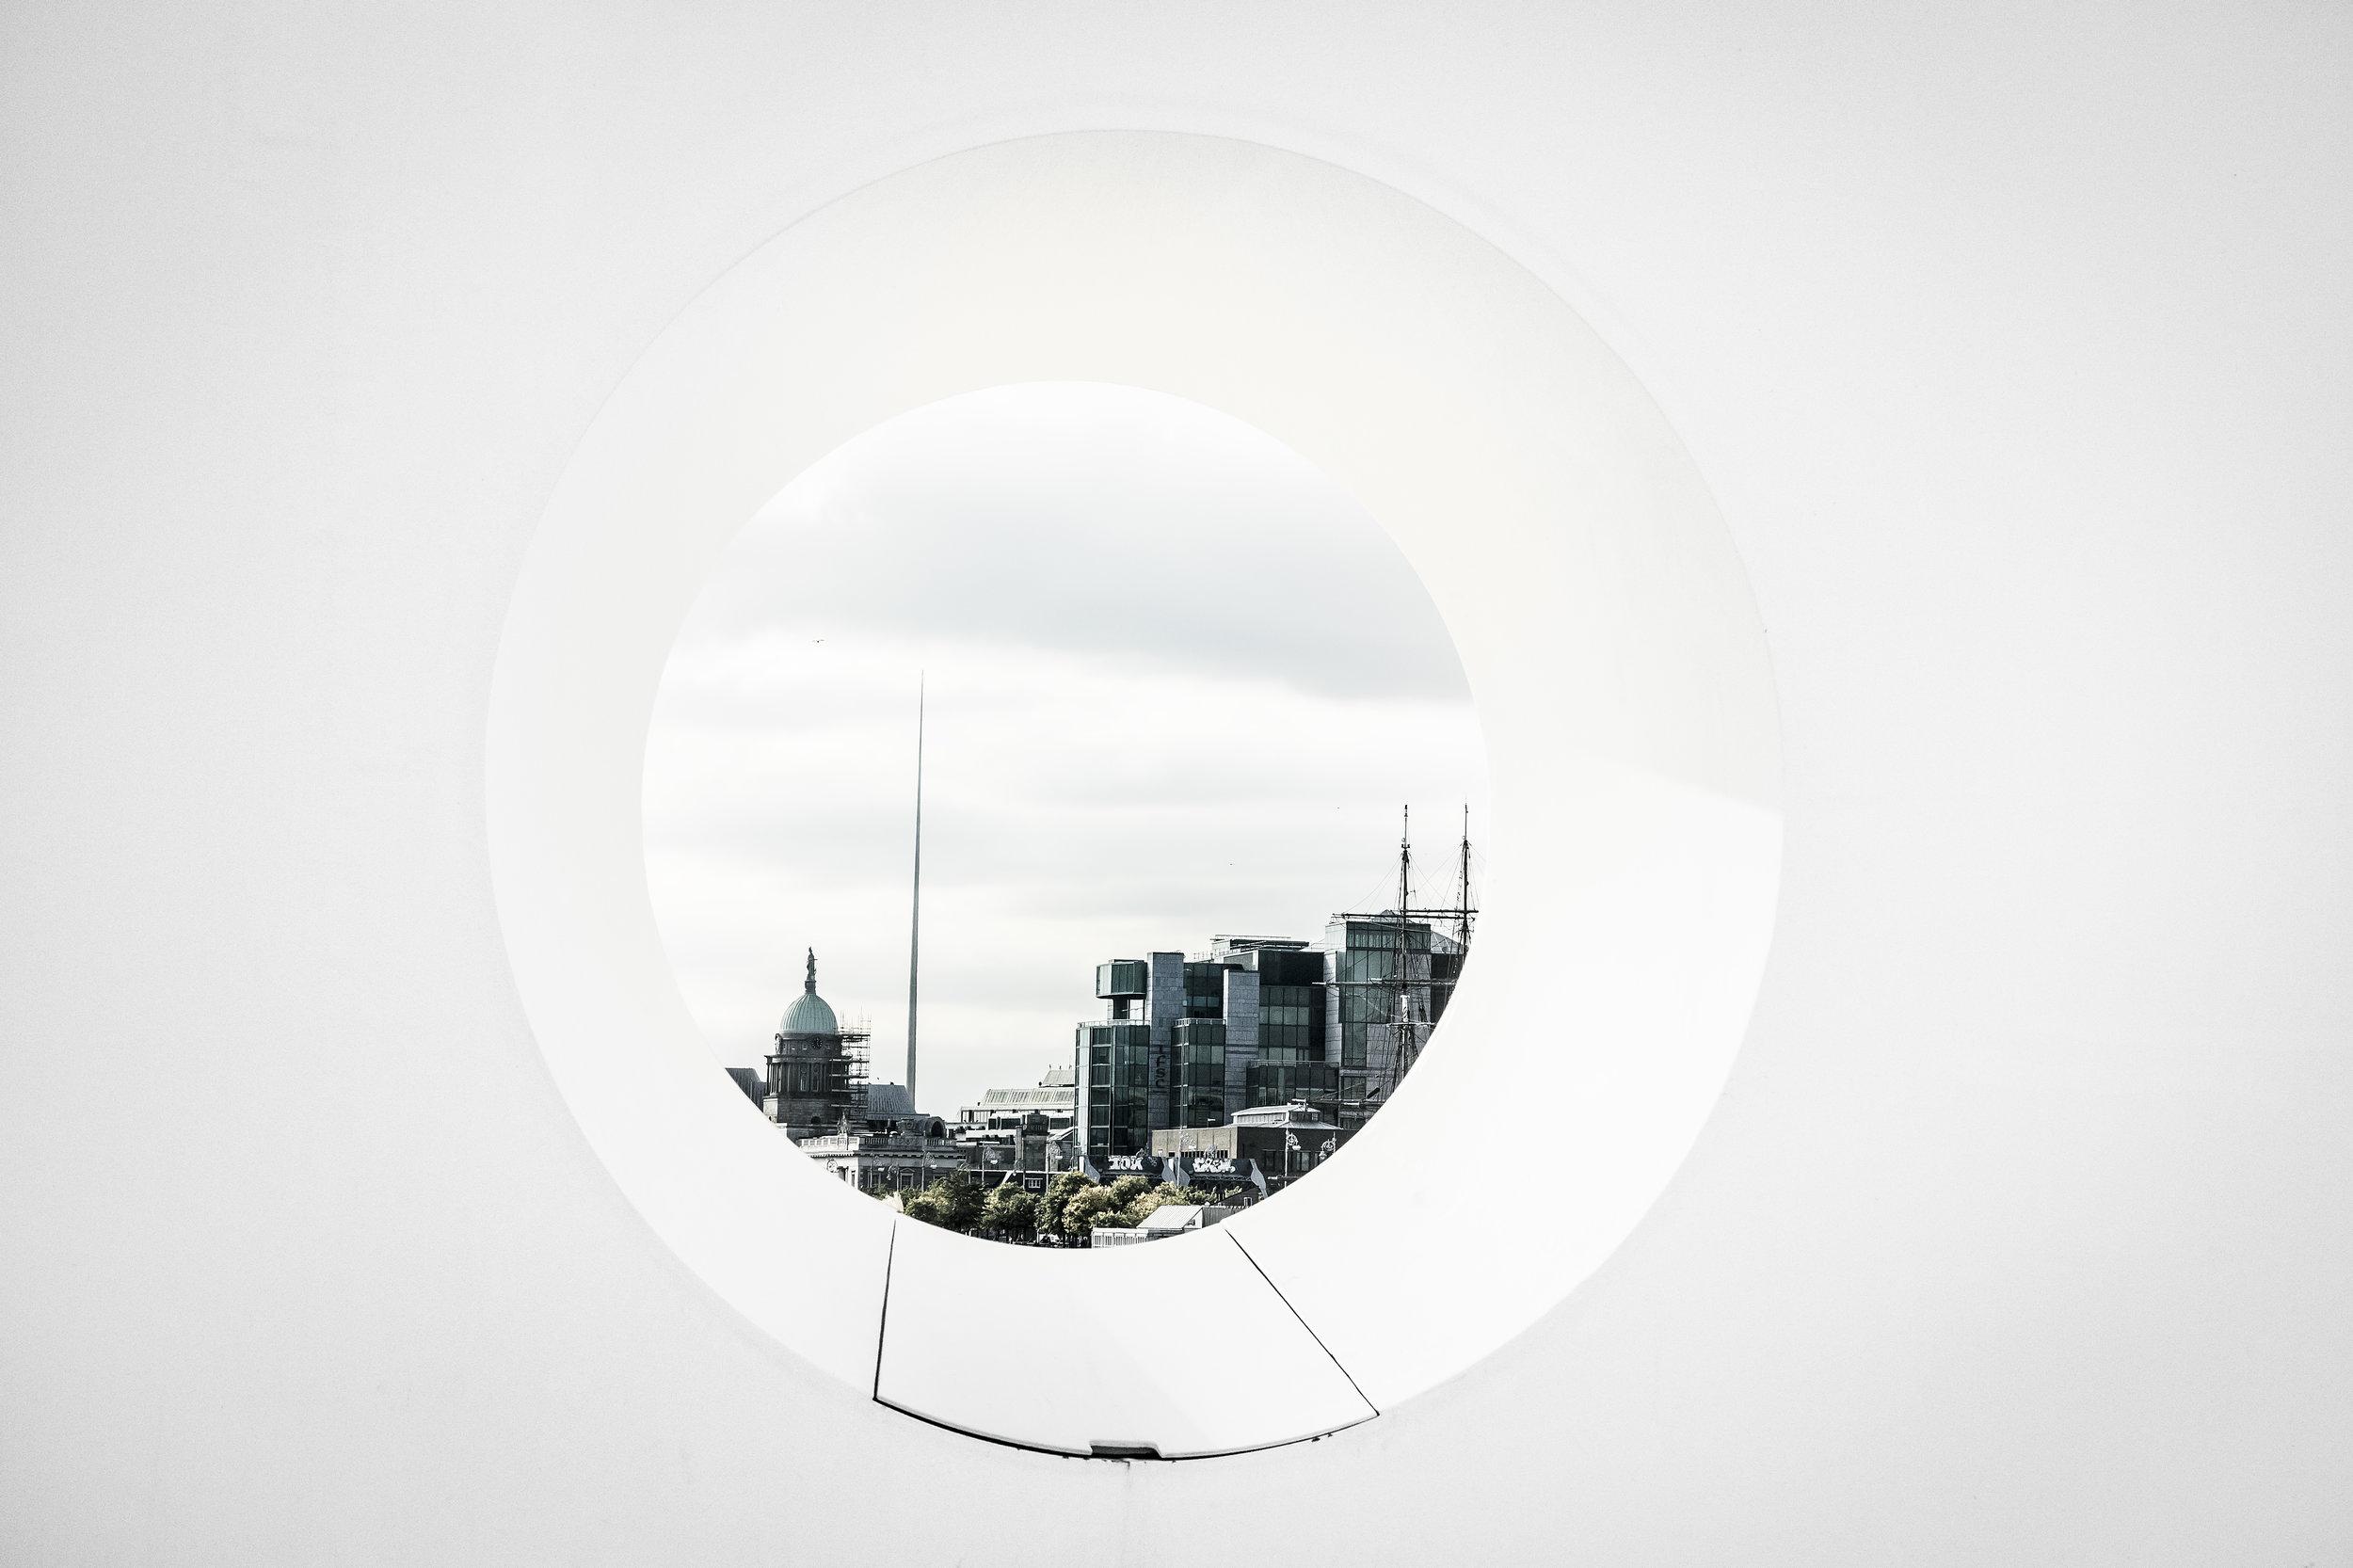 fabio_burrelli_street_photography_architecture_dublin_CP5B0565-2CP5B0565-2.jpg